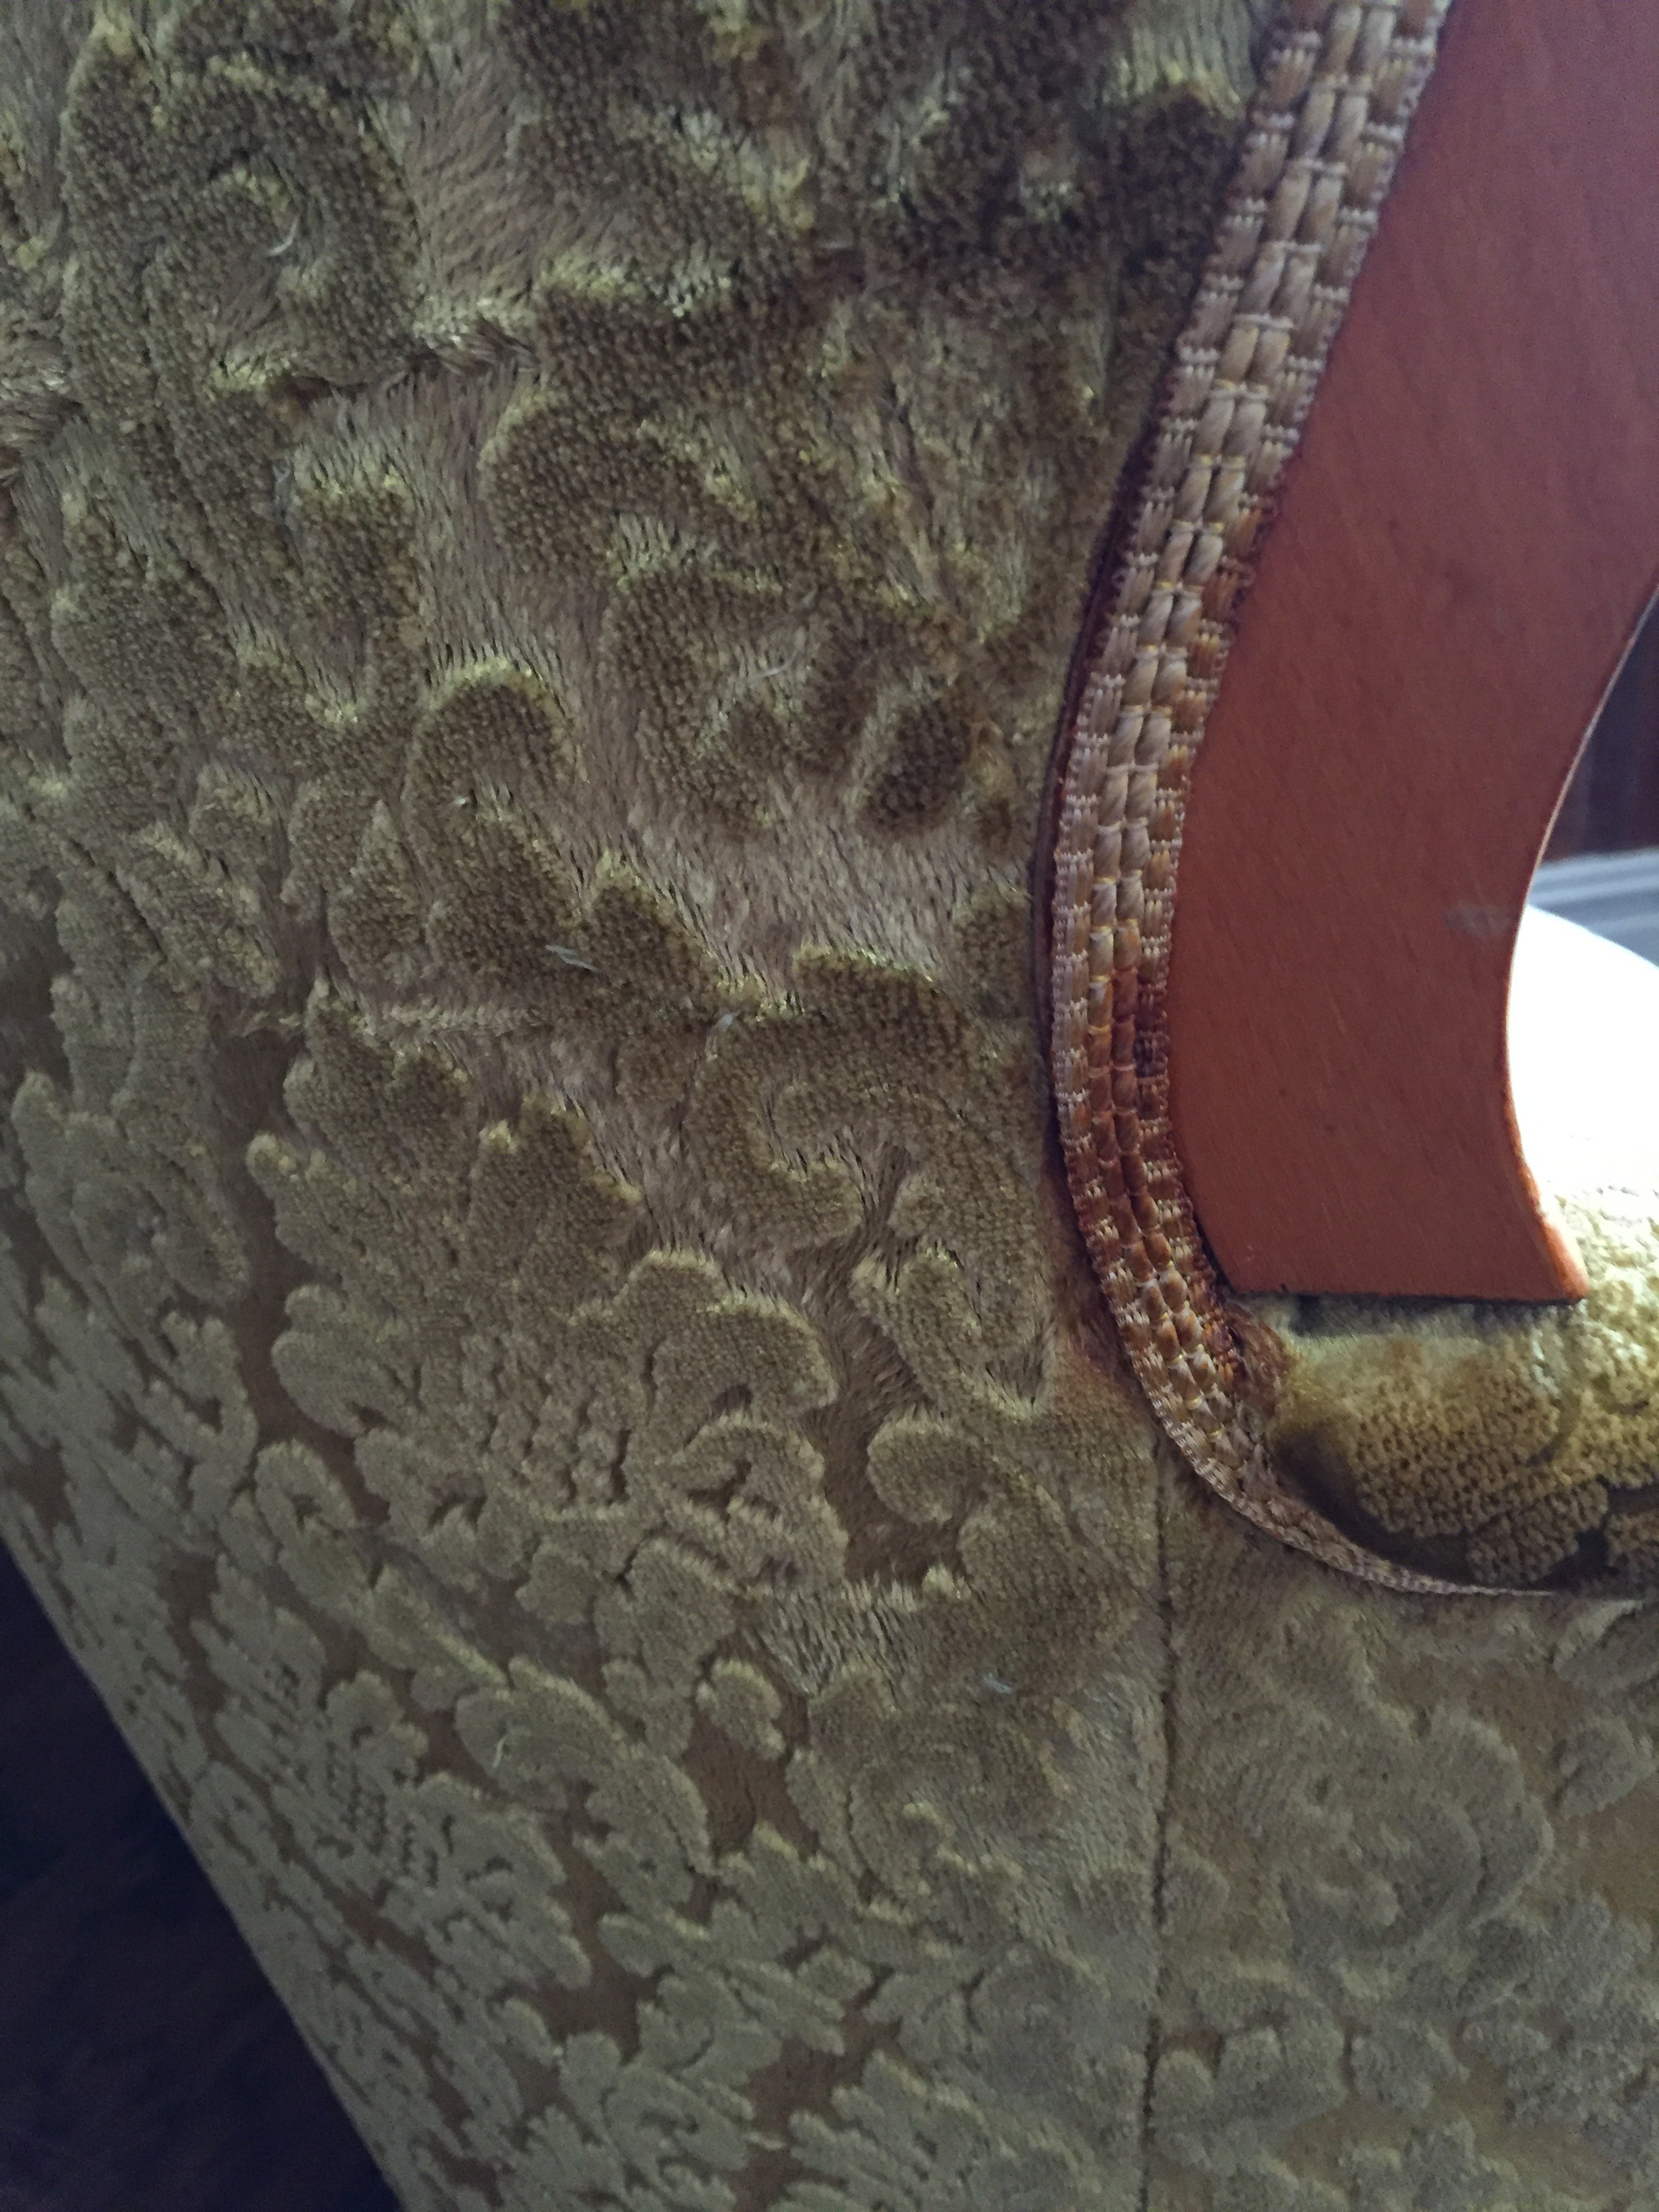 Close up of damage